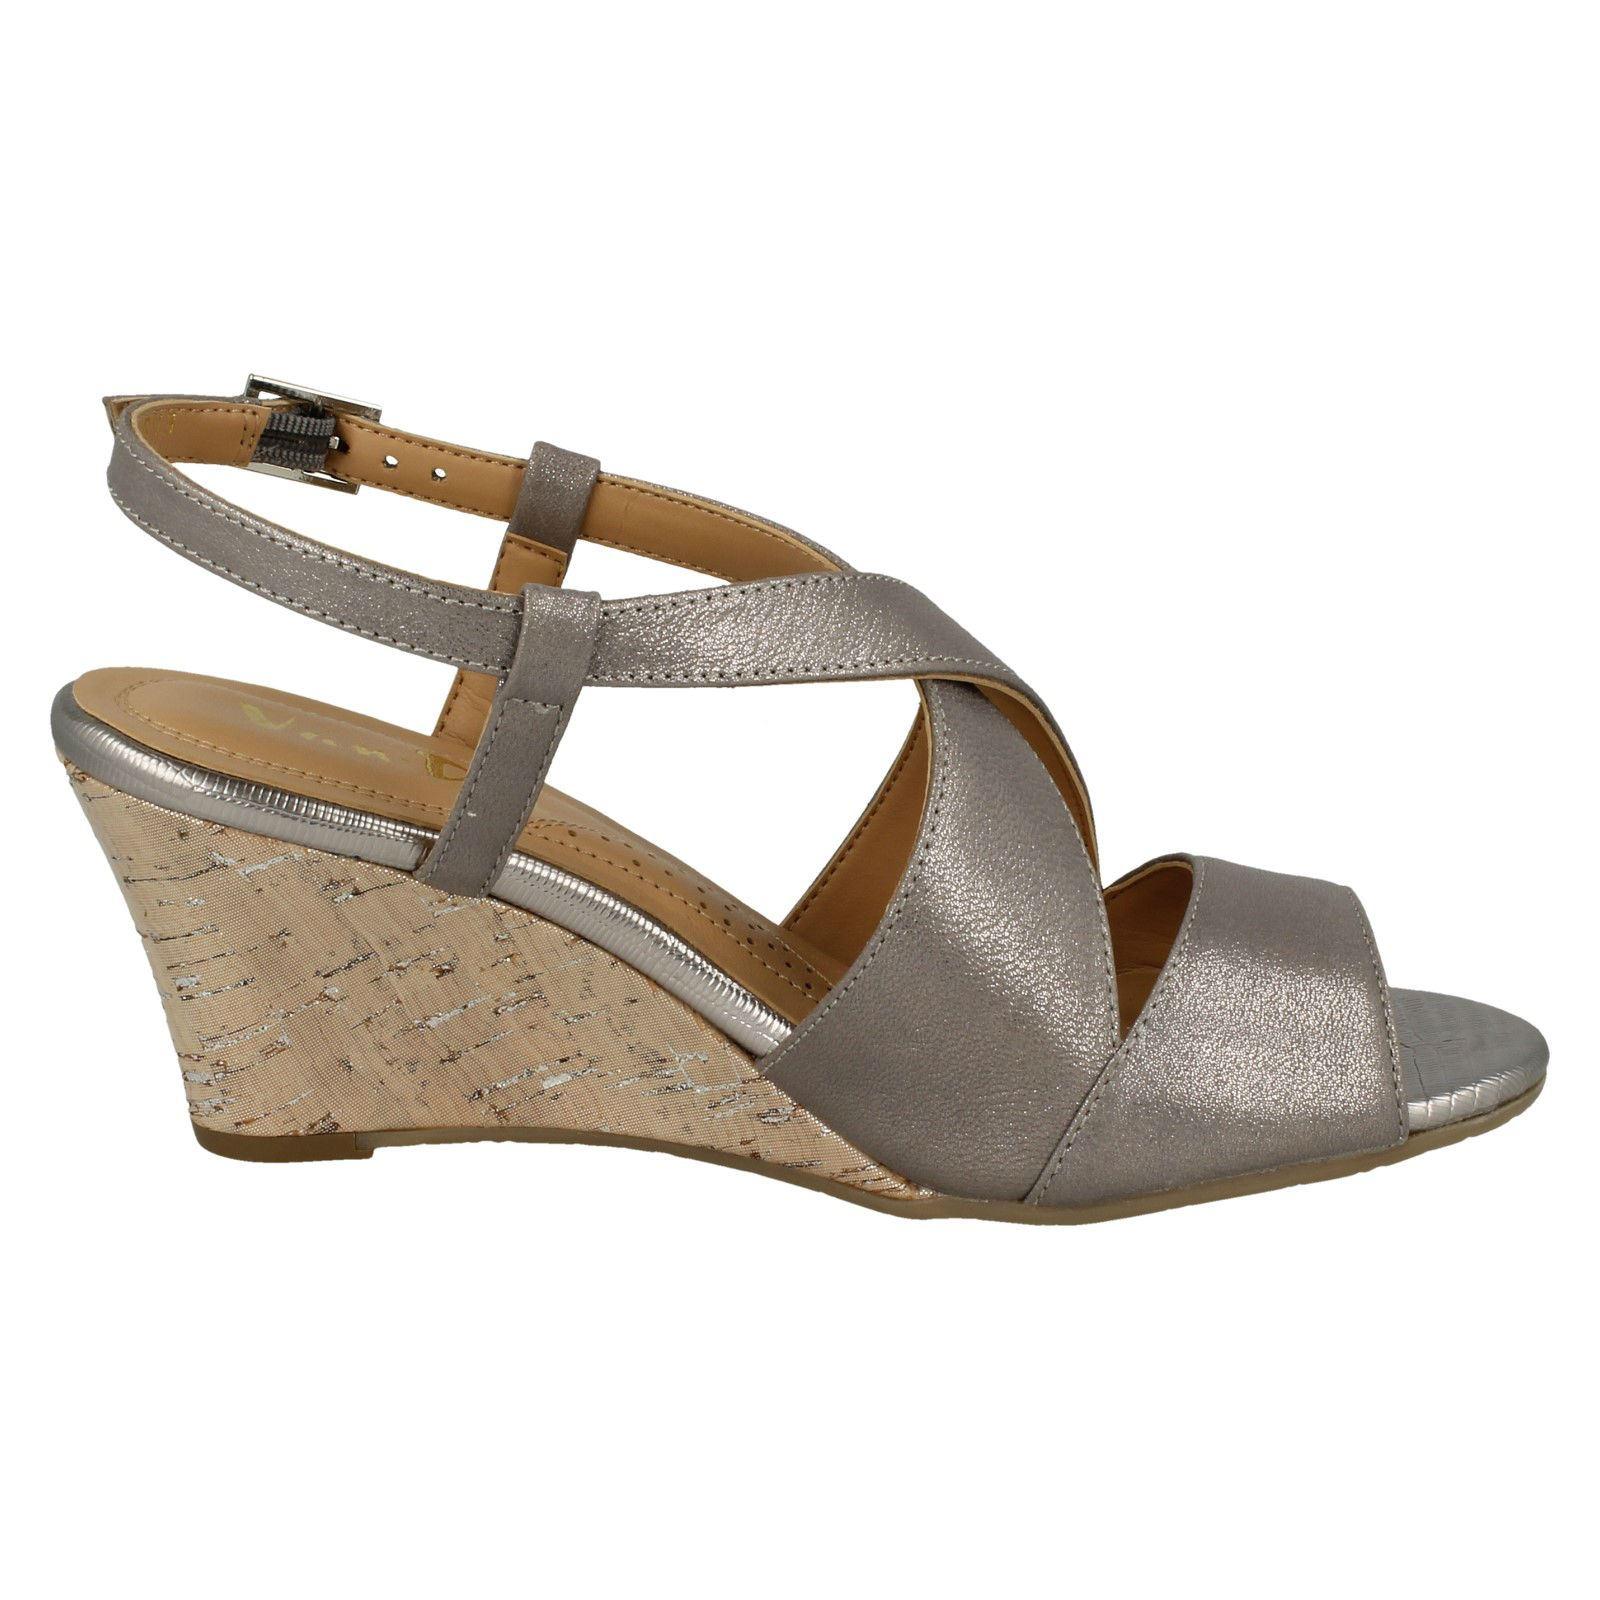 Ladies-Van-Dal-Cross-Strap-Wedged-Sandal-Allora thumbnail 24